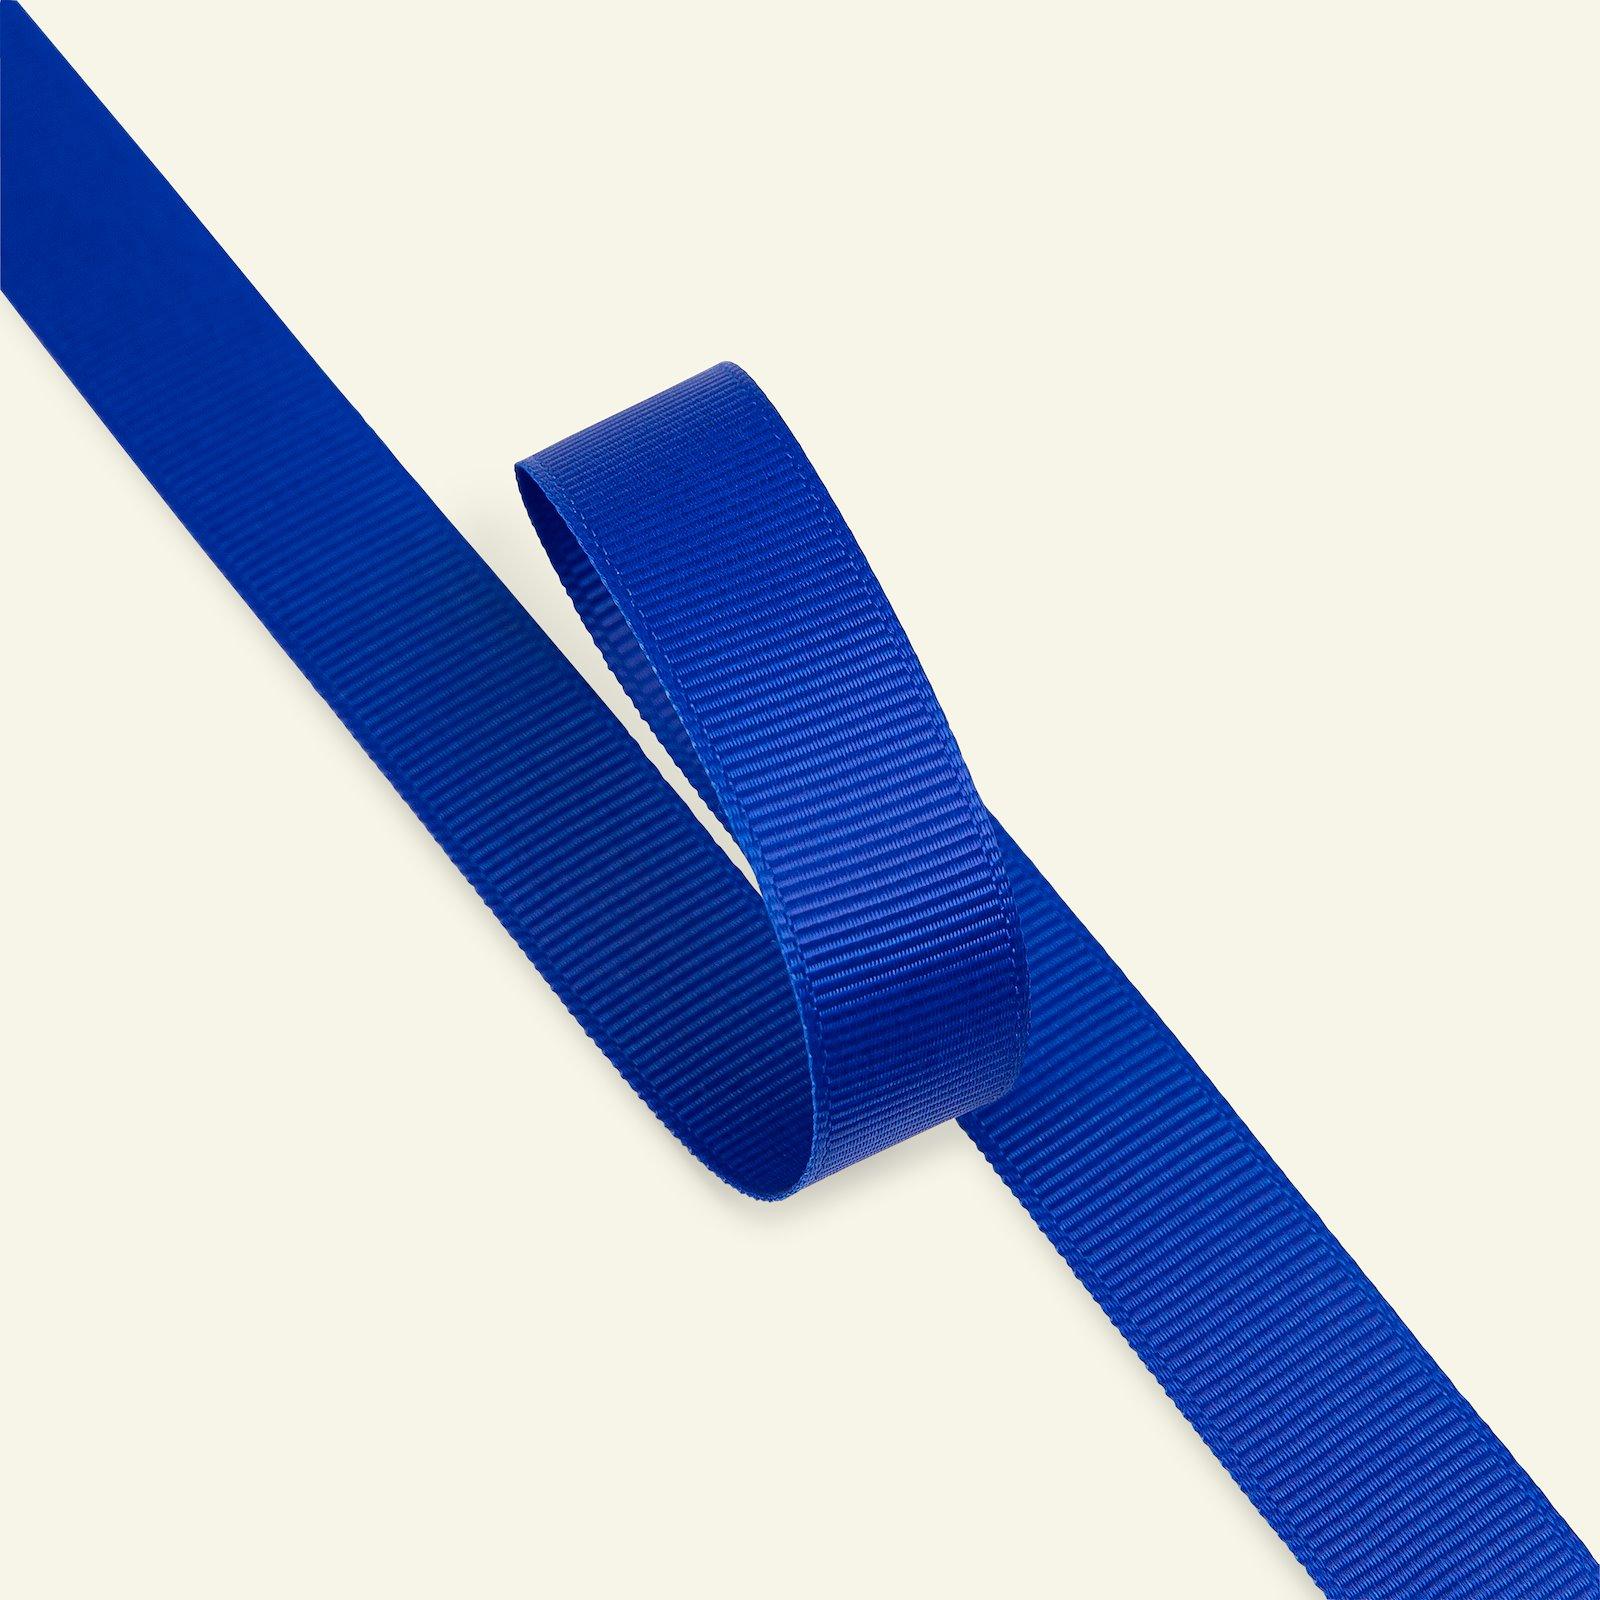 Gros grain ribbon 15mm cobolt 5m 73149_pack